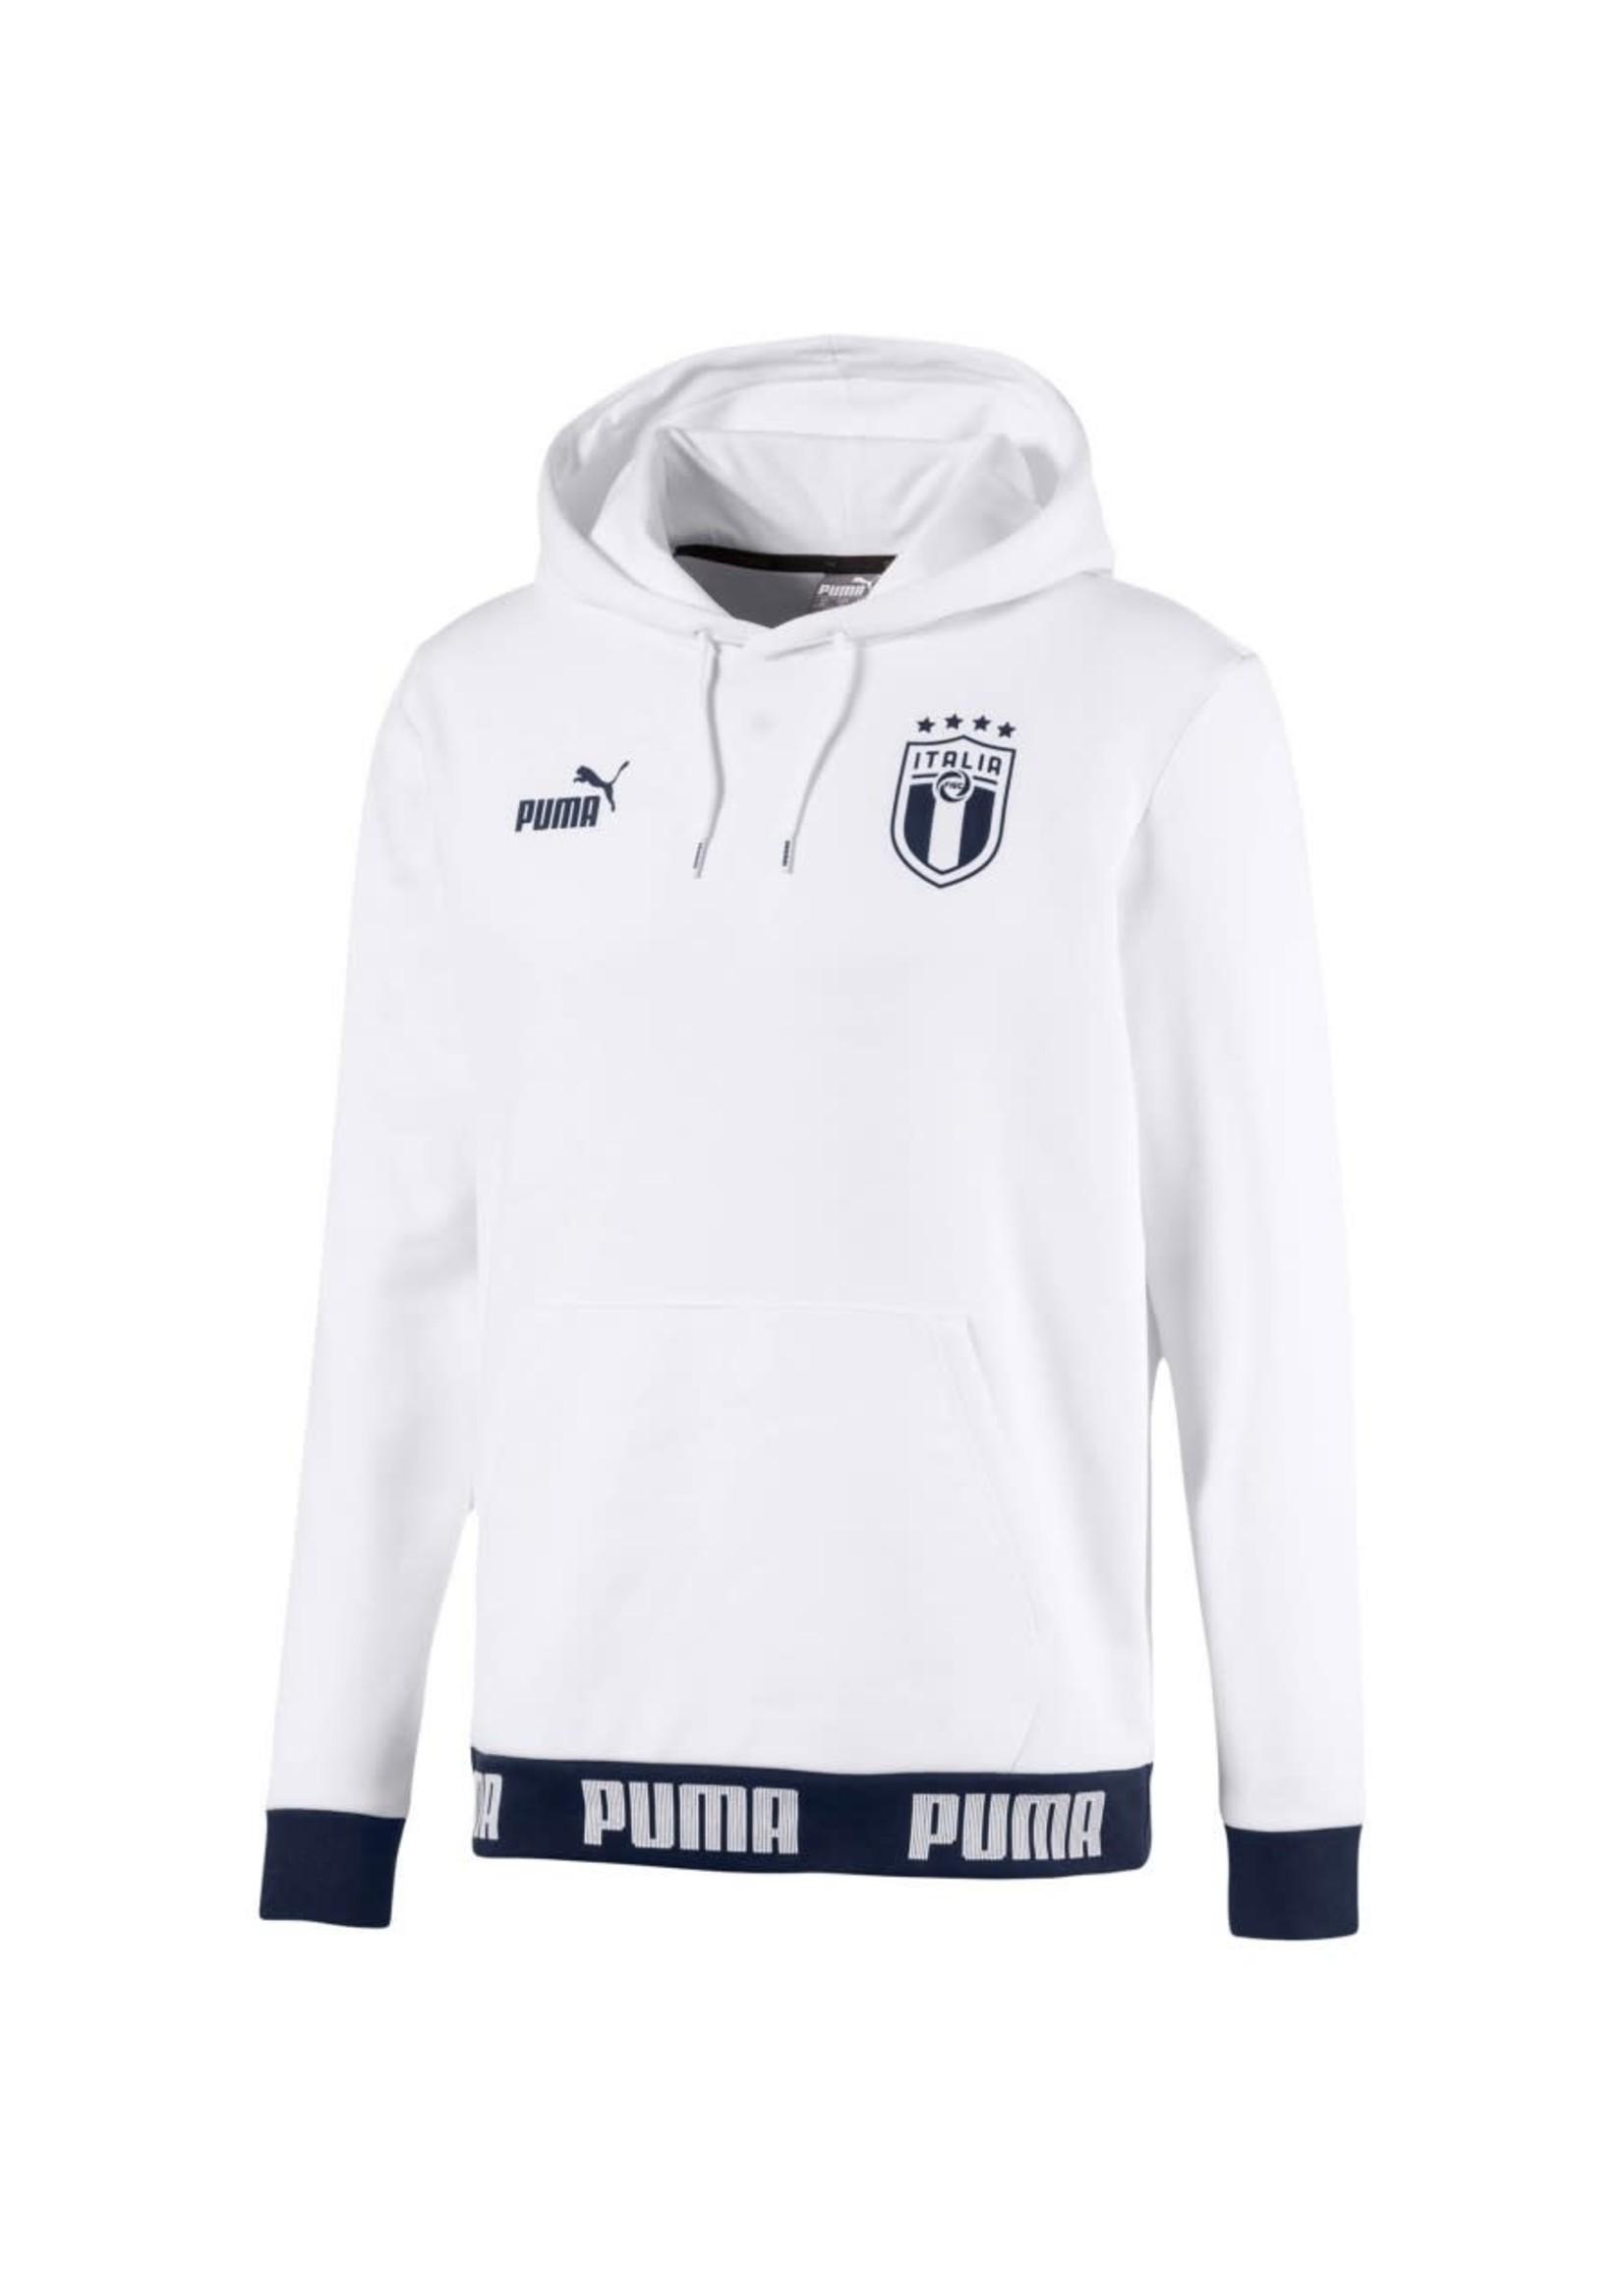 Puma Italy Hoodie - 757247 02